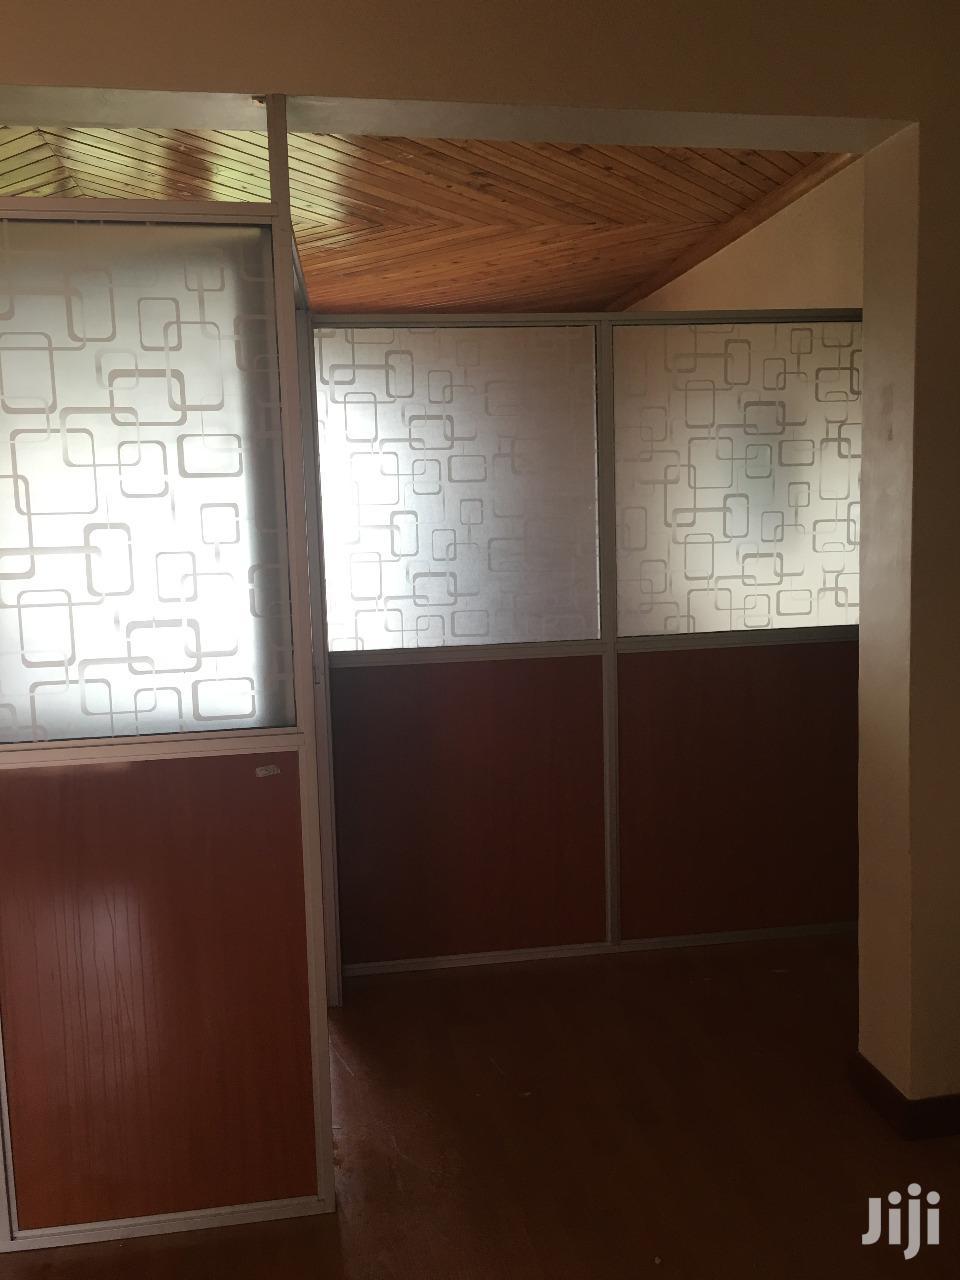 Interiors Wall Partitioning